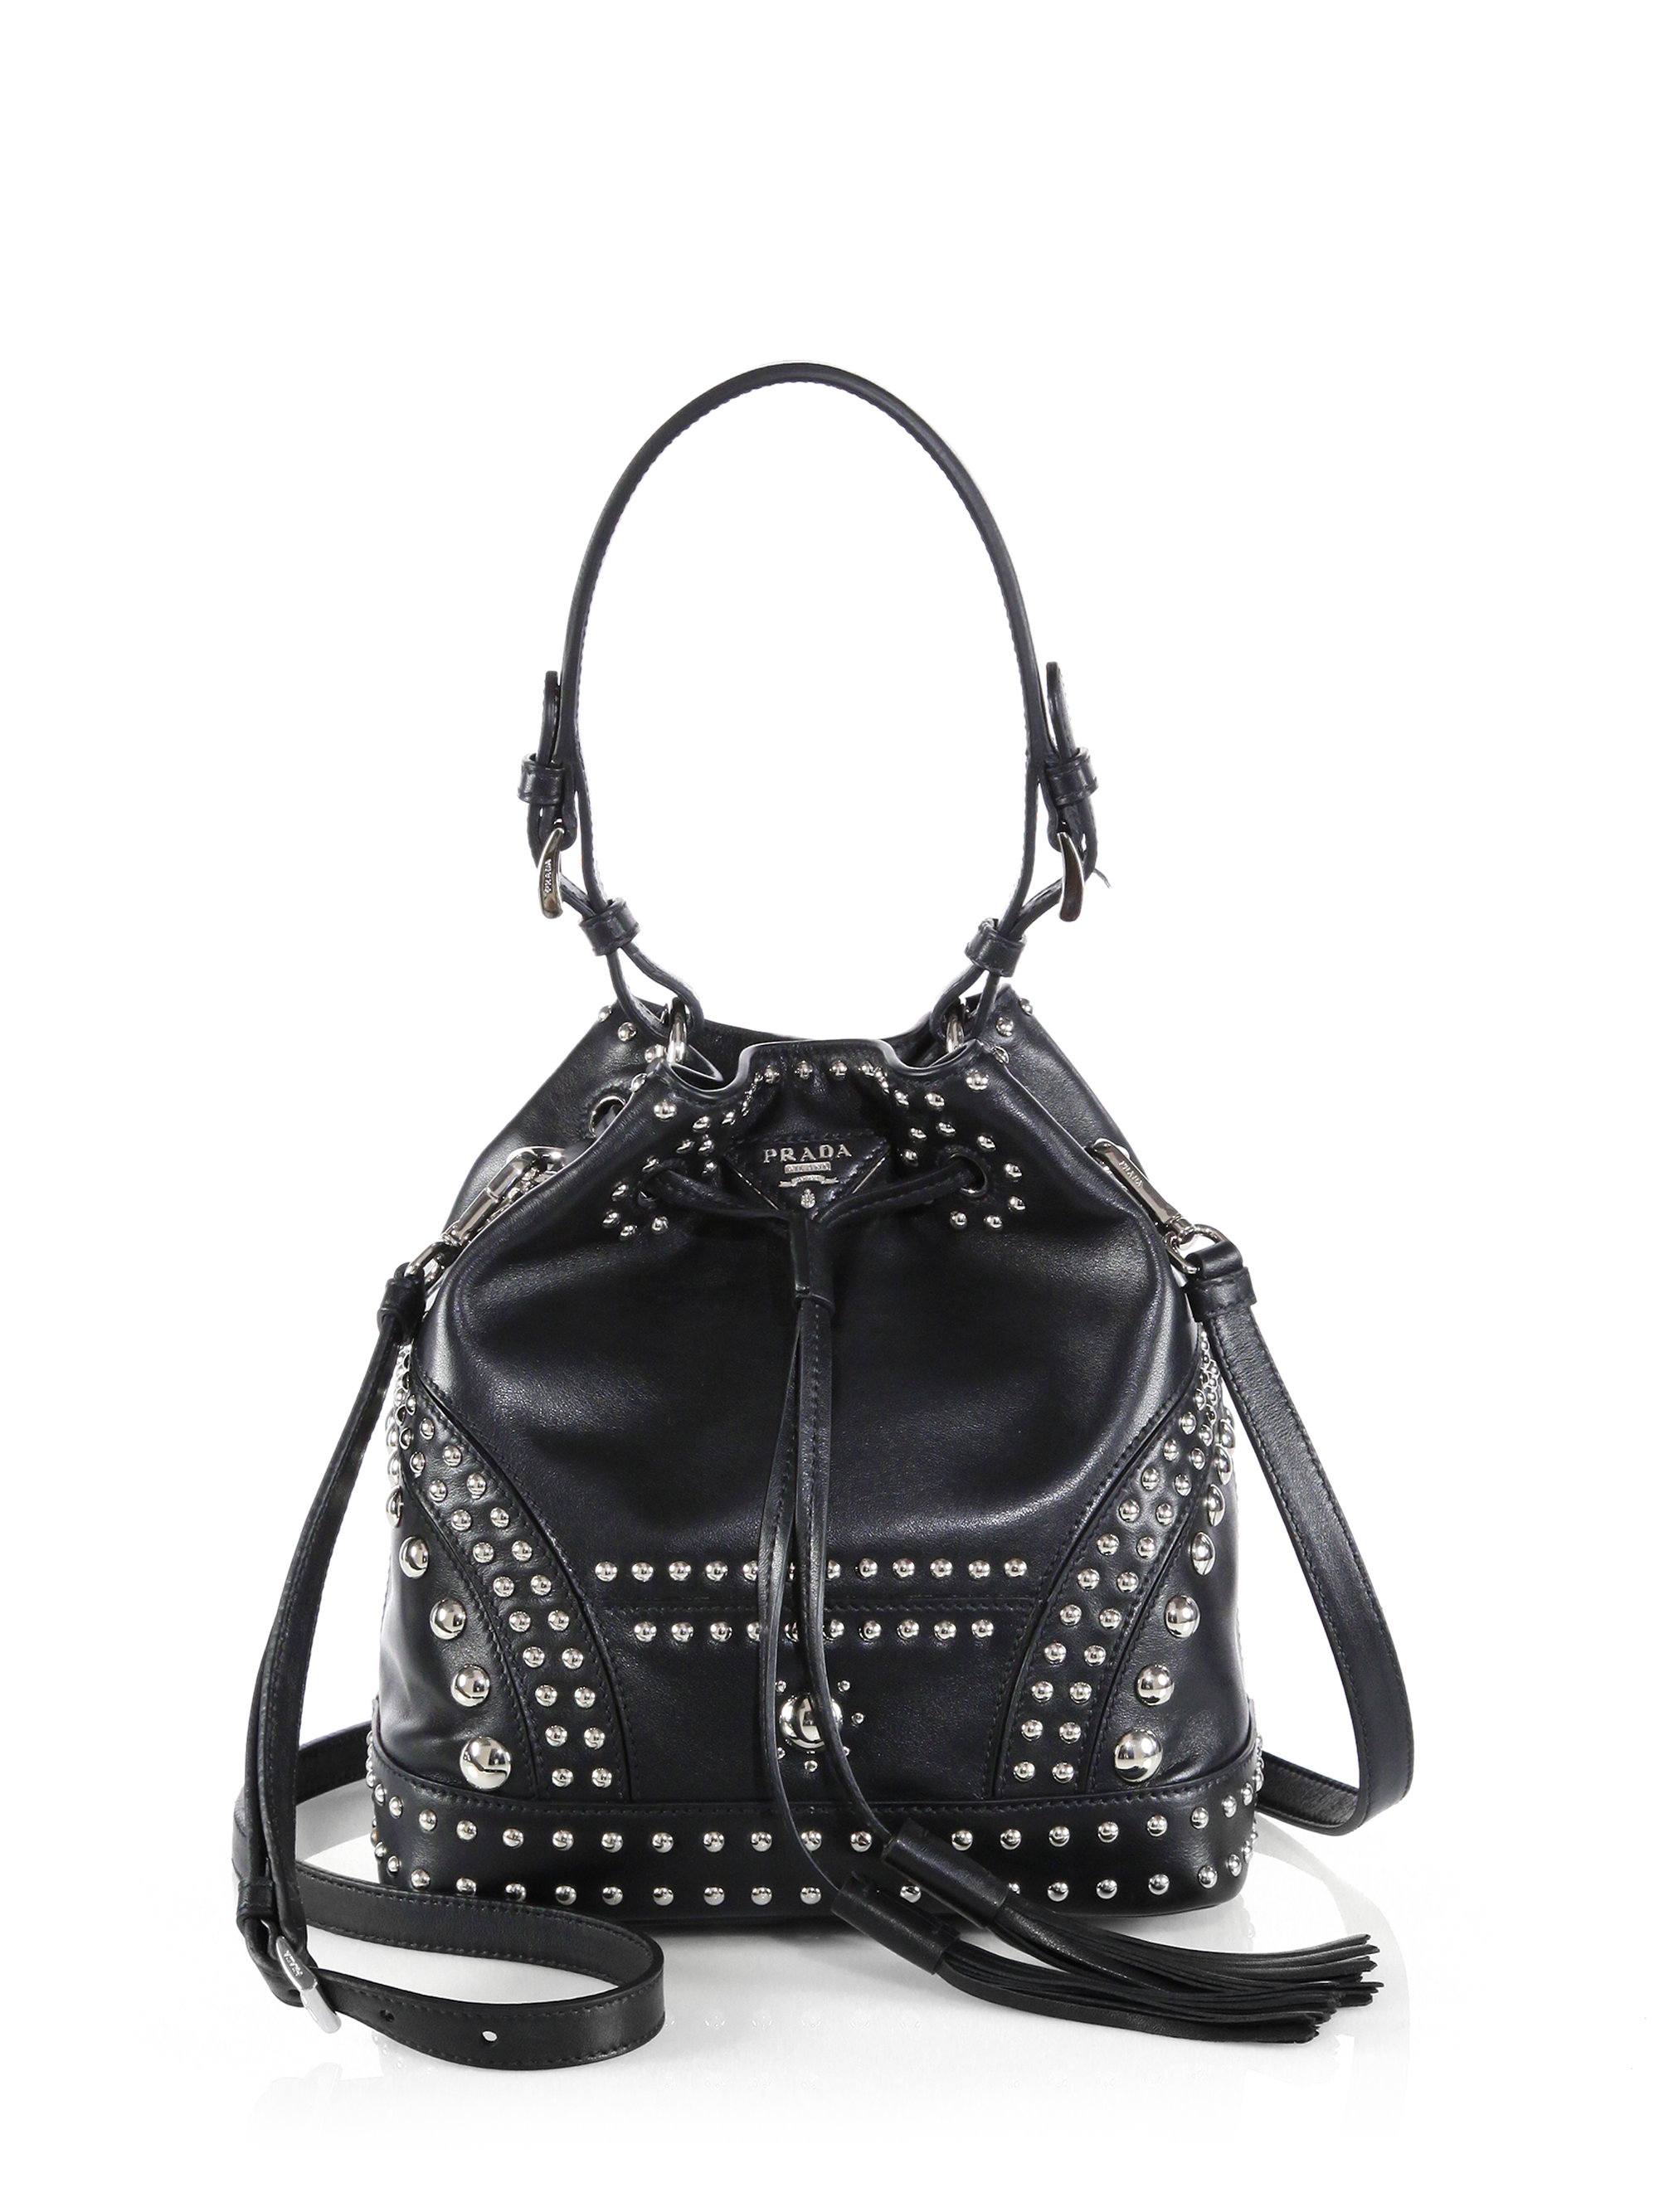 7e1d4b974786 Lyst - Prada Soft Calf Studded Small Bucket Bag in Black